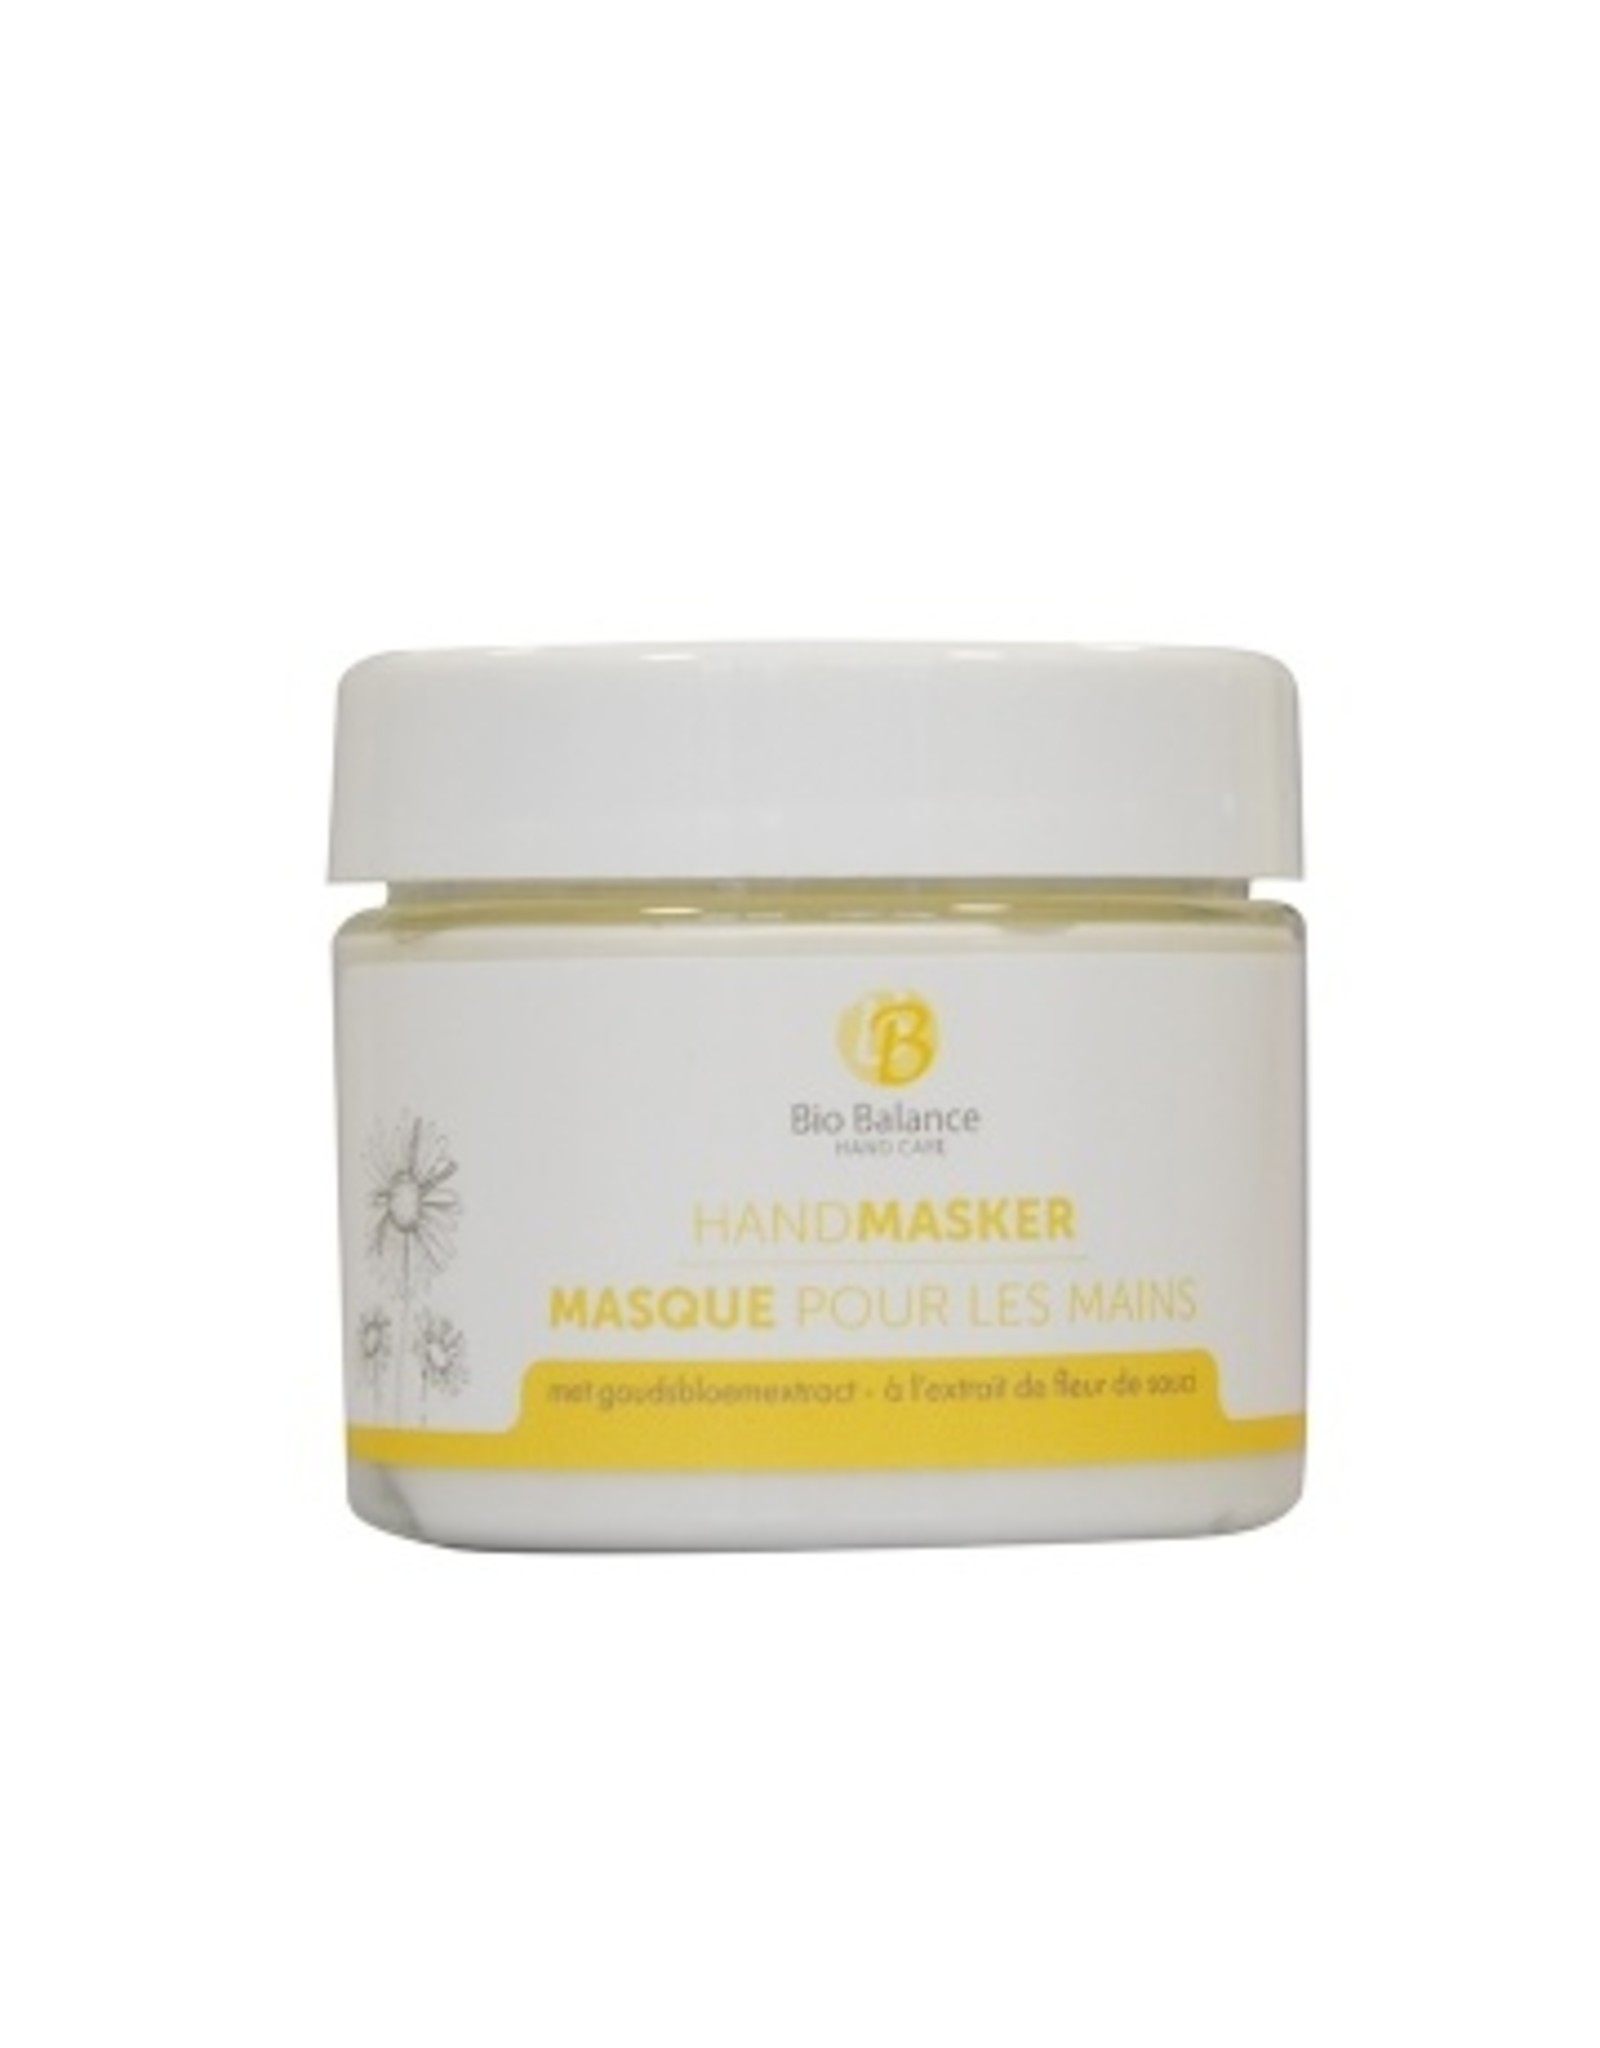 Bio Balance Hand Mask with Marigold extract - Bio Balance